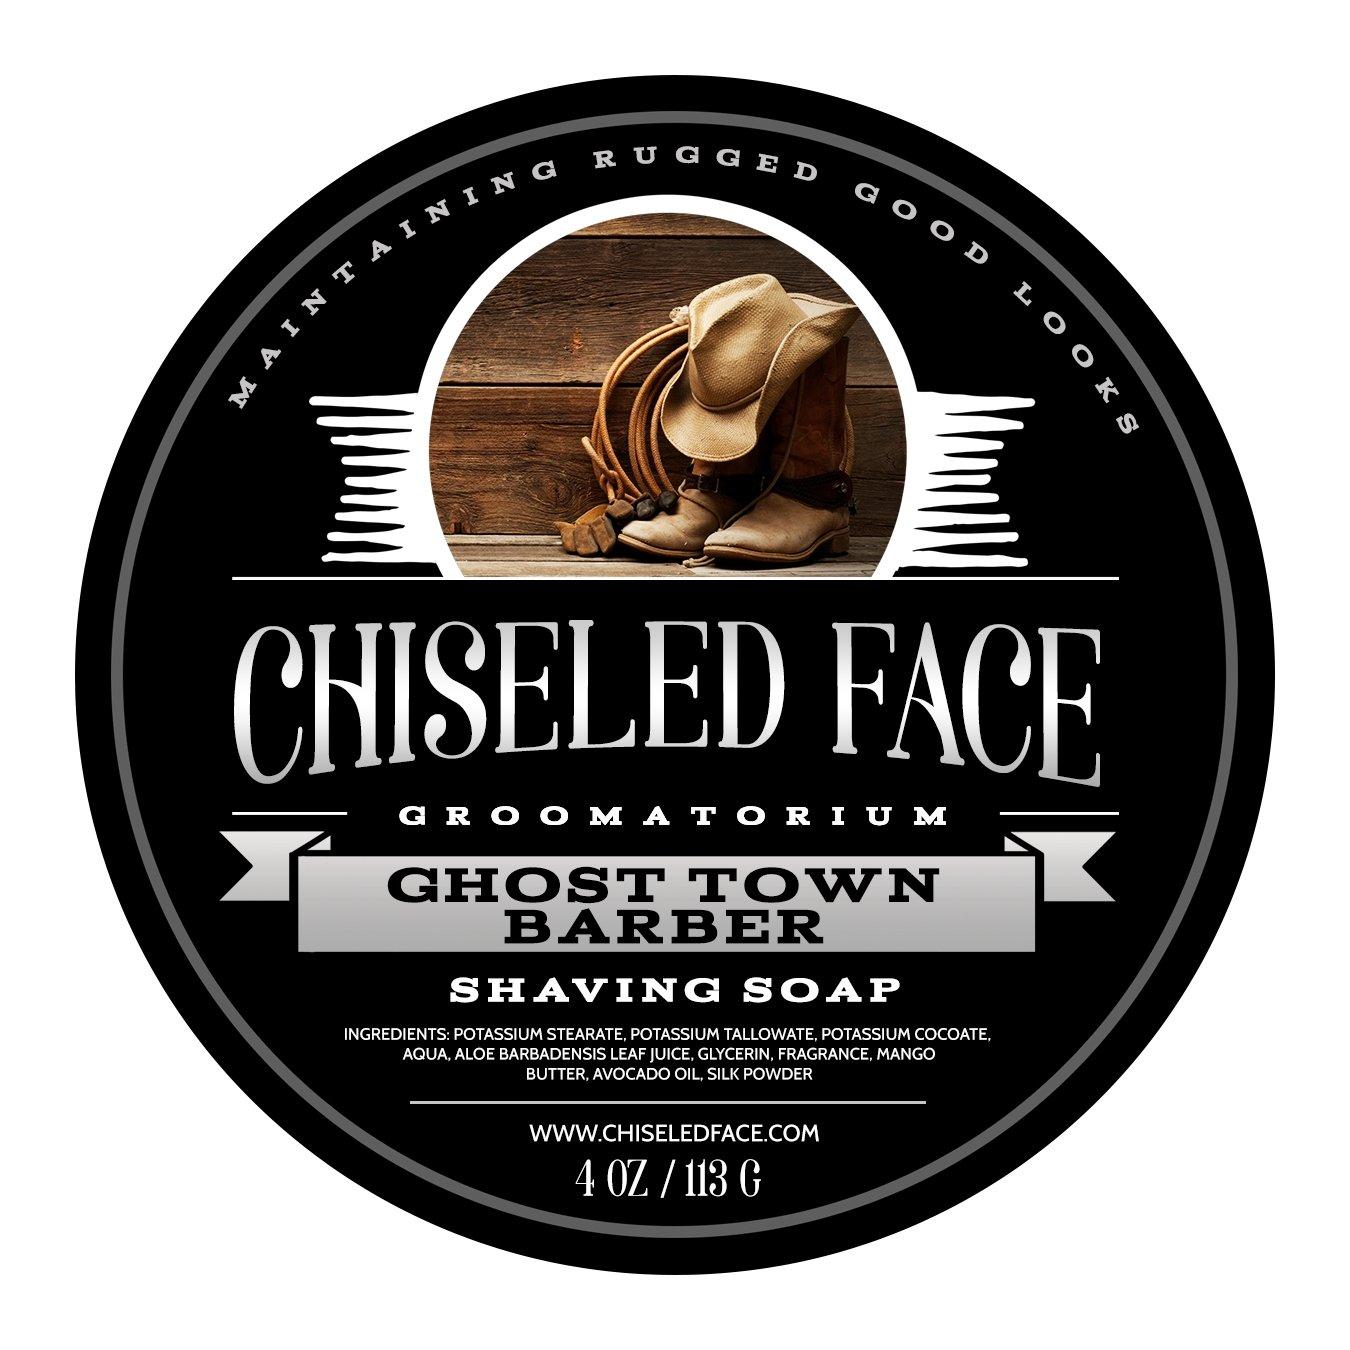 Ghost Town Barber - Handmade Luxury Shaving Soap from Chiseled Face Groomatorium